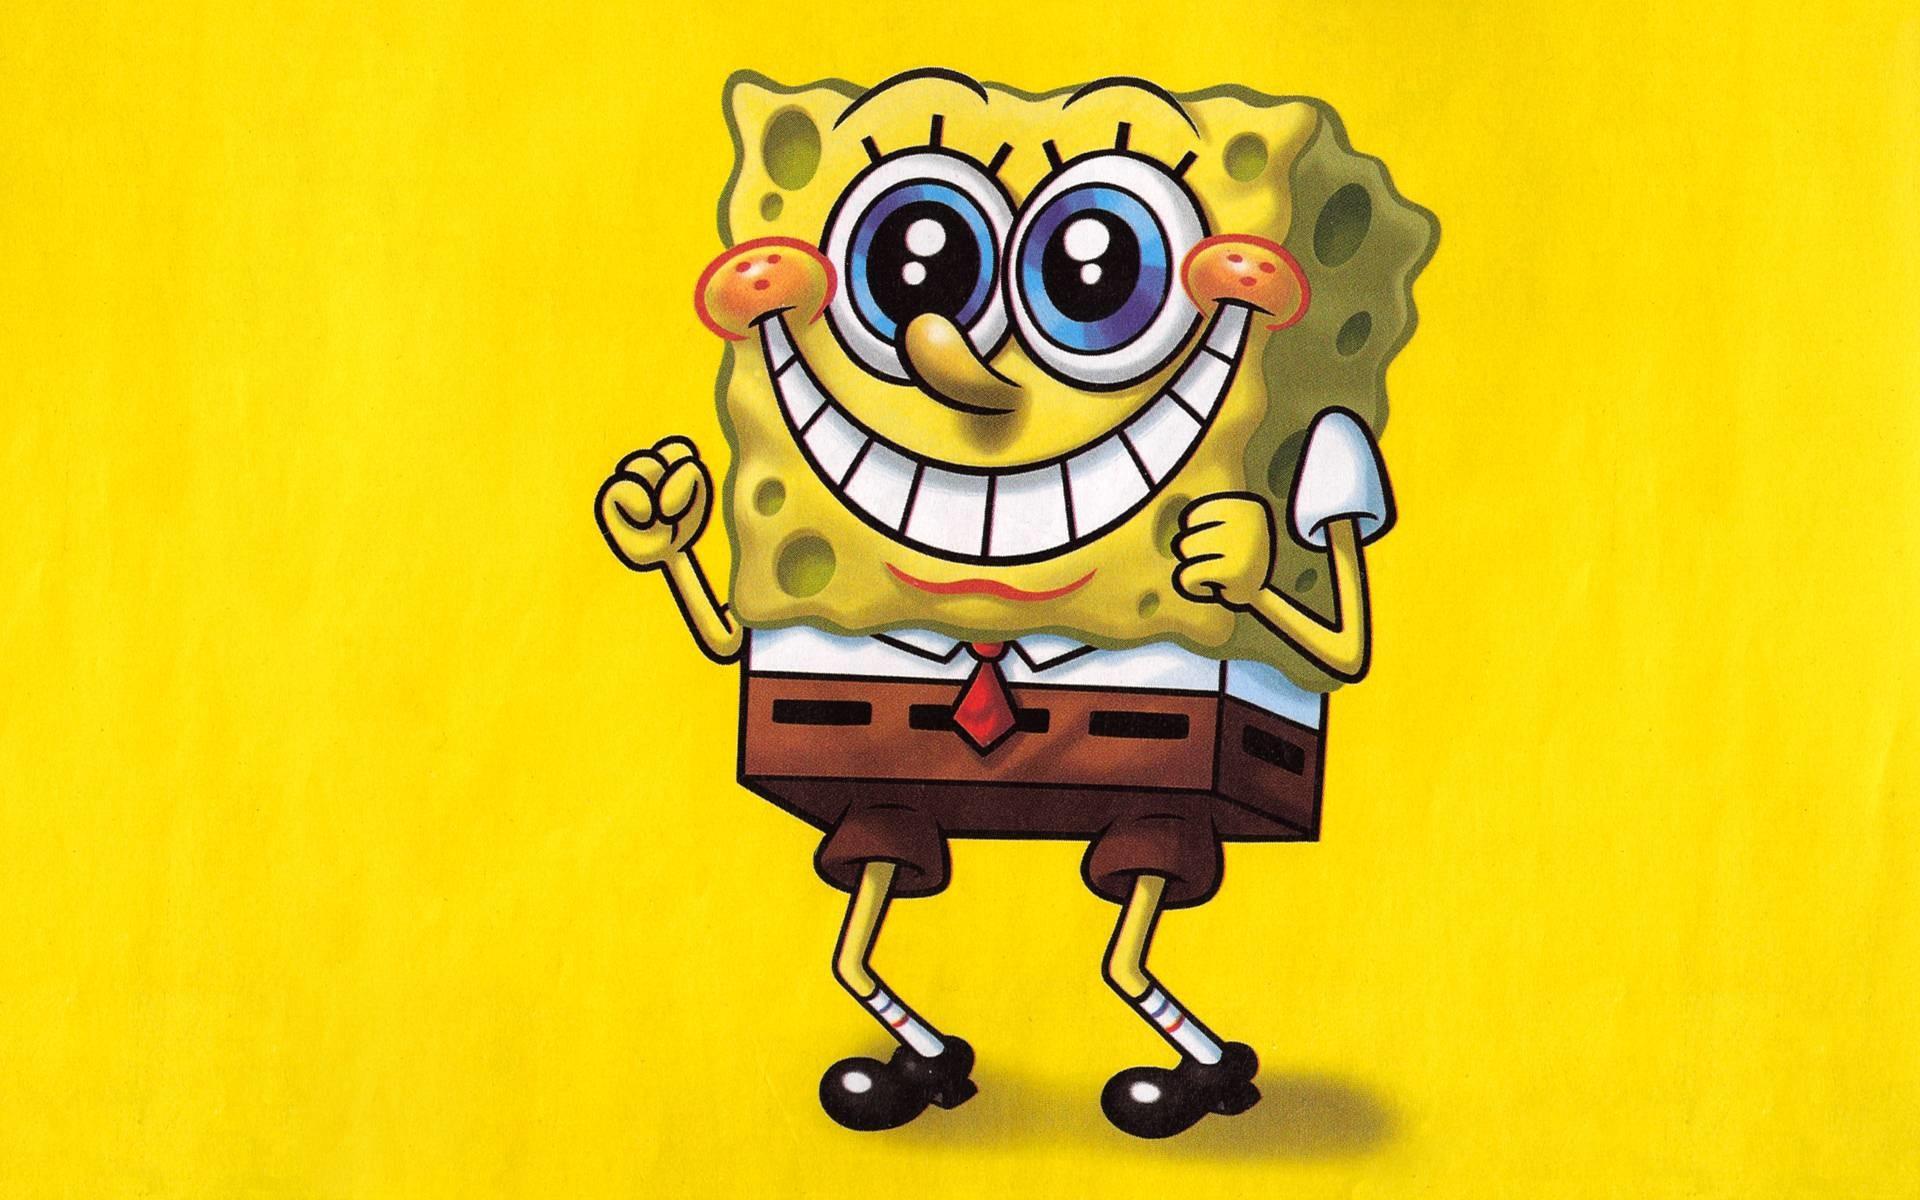 Gambar Wallpaper Kartun Spongebob Kumpulan Wallpaper